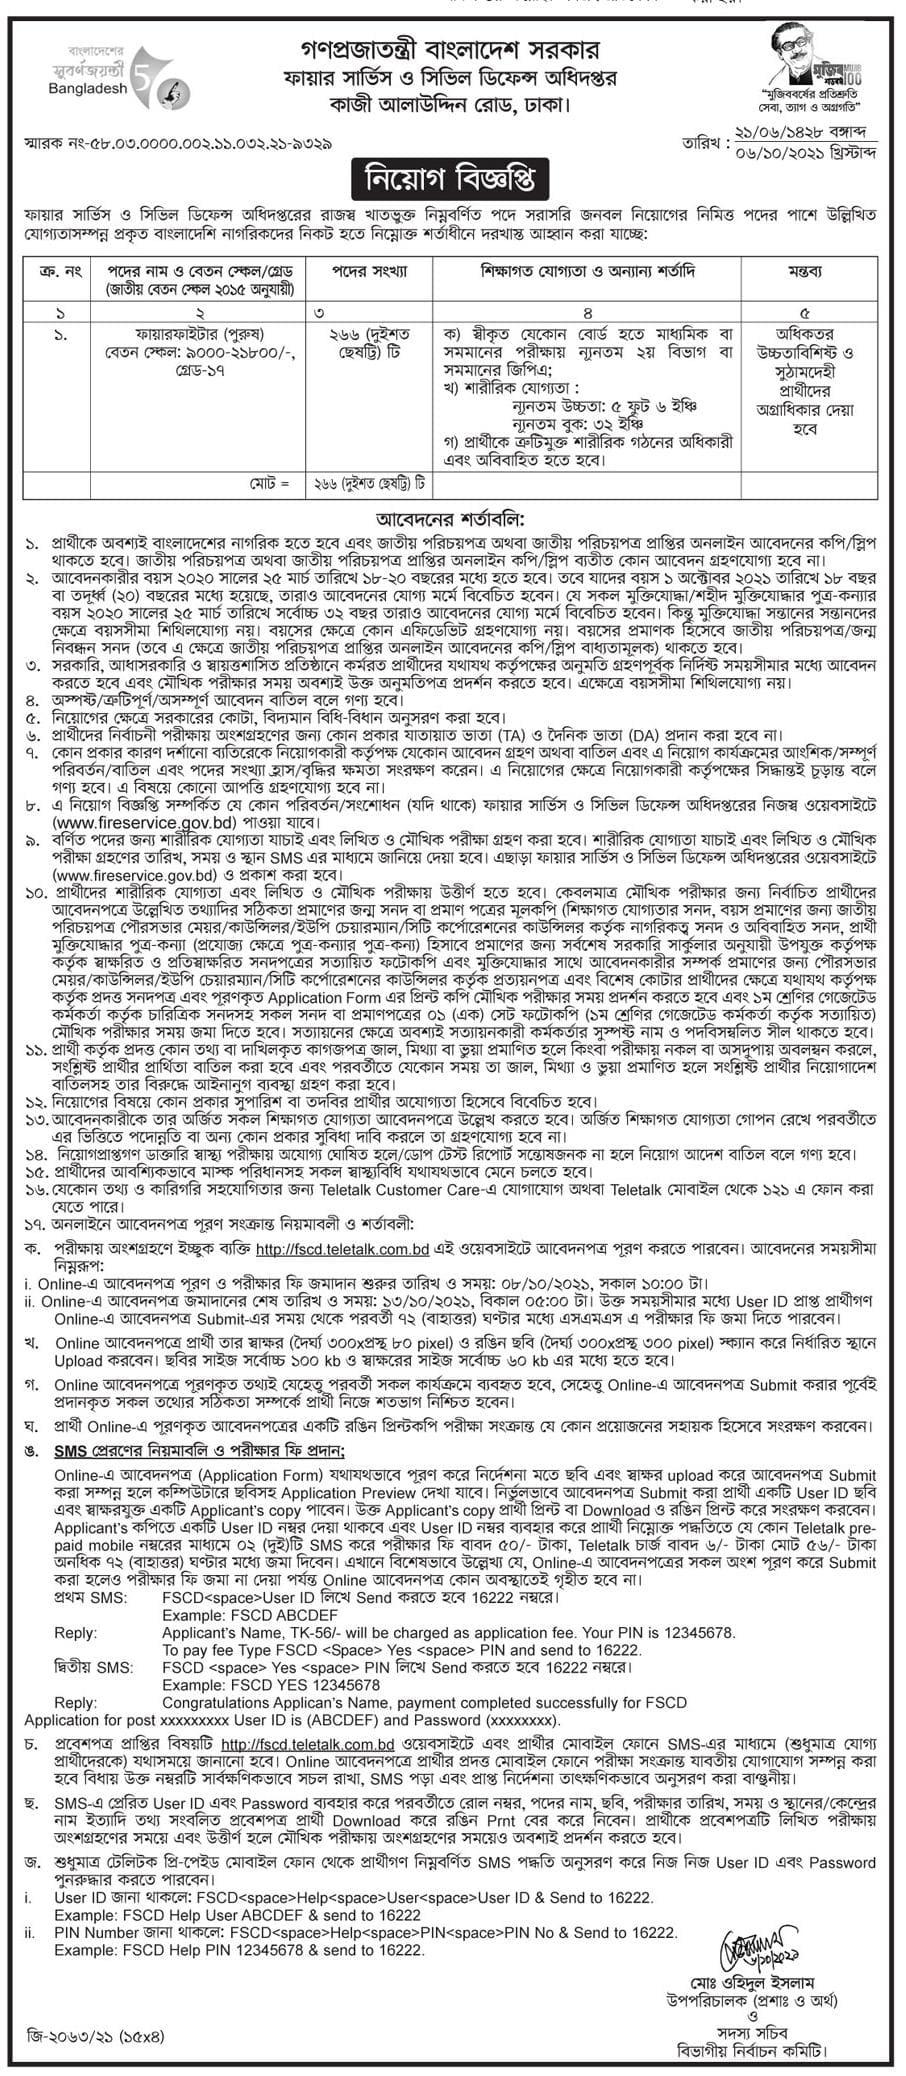 Bangladesh Fire Service and civil Defense Job Circular 2021